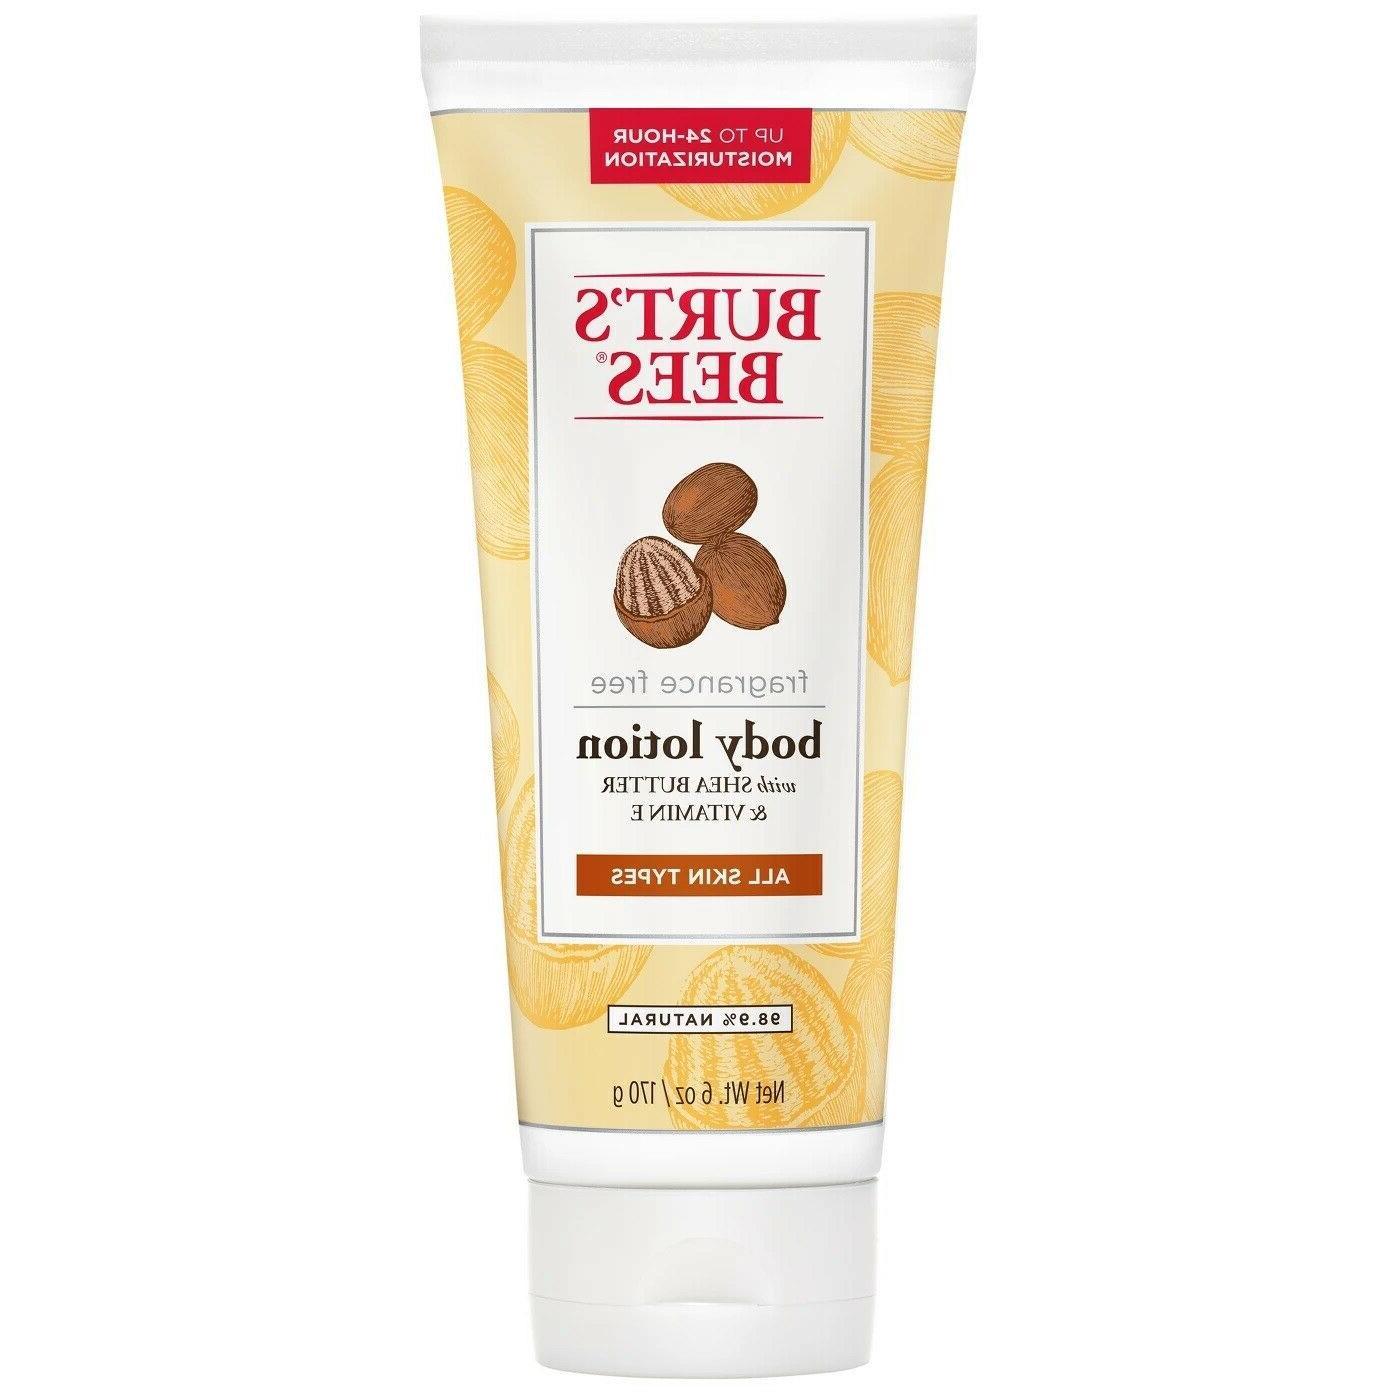 Burt's Bees Shea Butter and Vitamin E Body Lotion - Fragranc